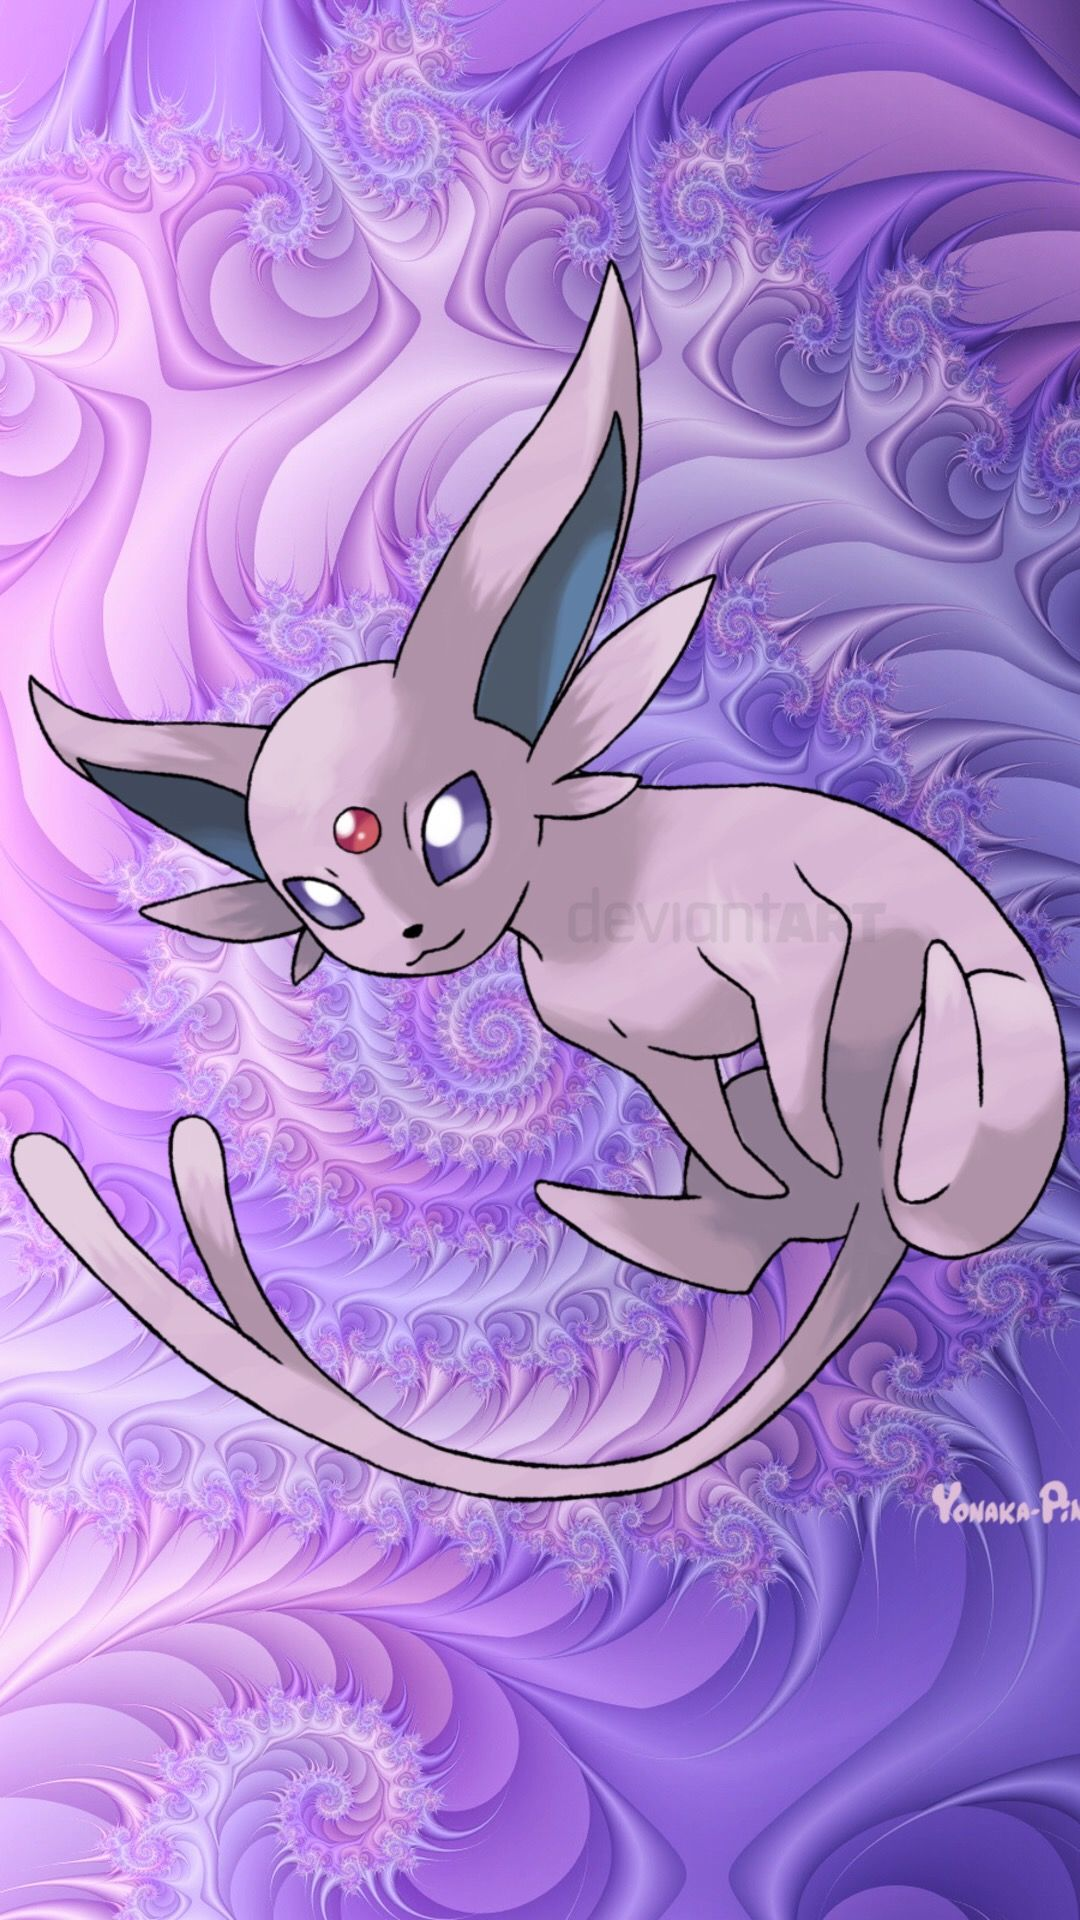 Espeon wallpaper | Pokémon | Pinterest | Wallpaper, Pokémon and …